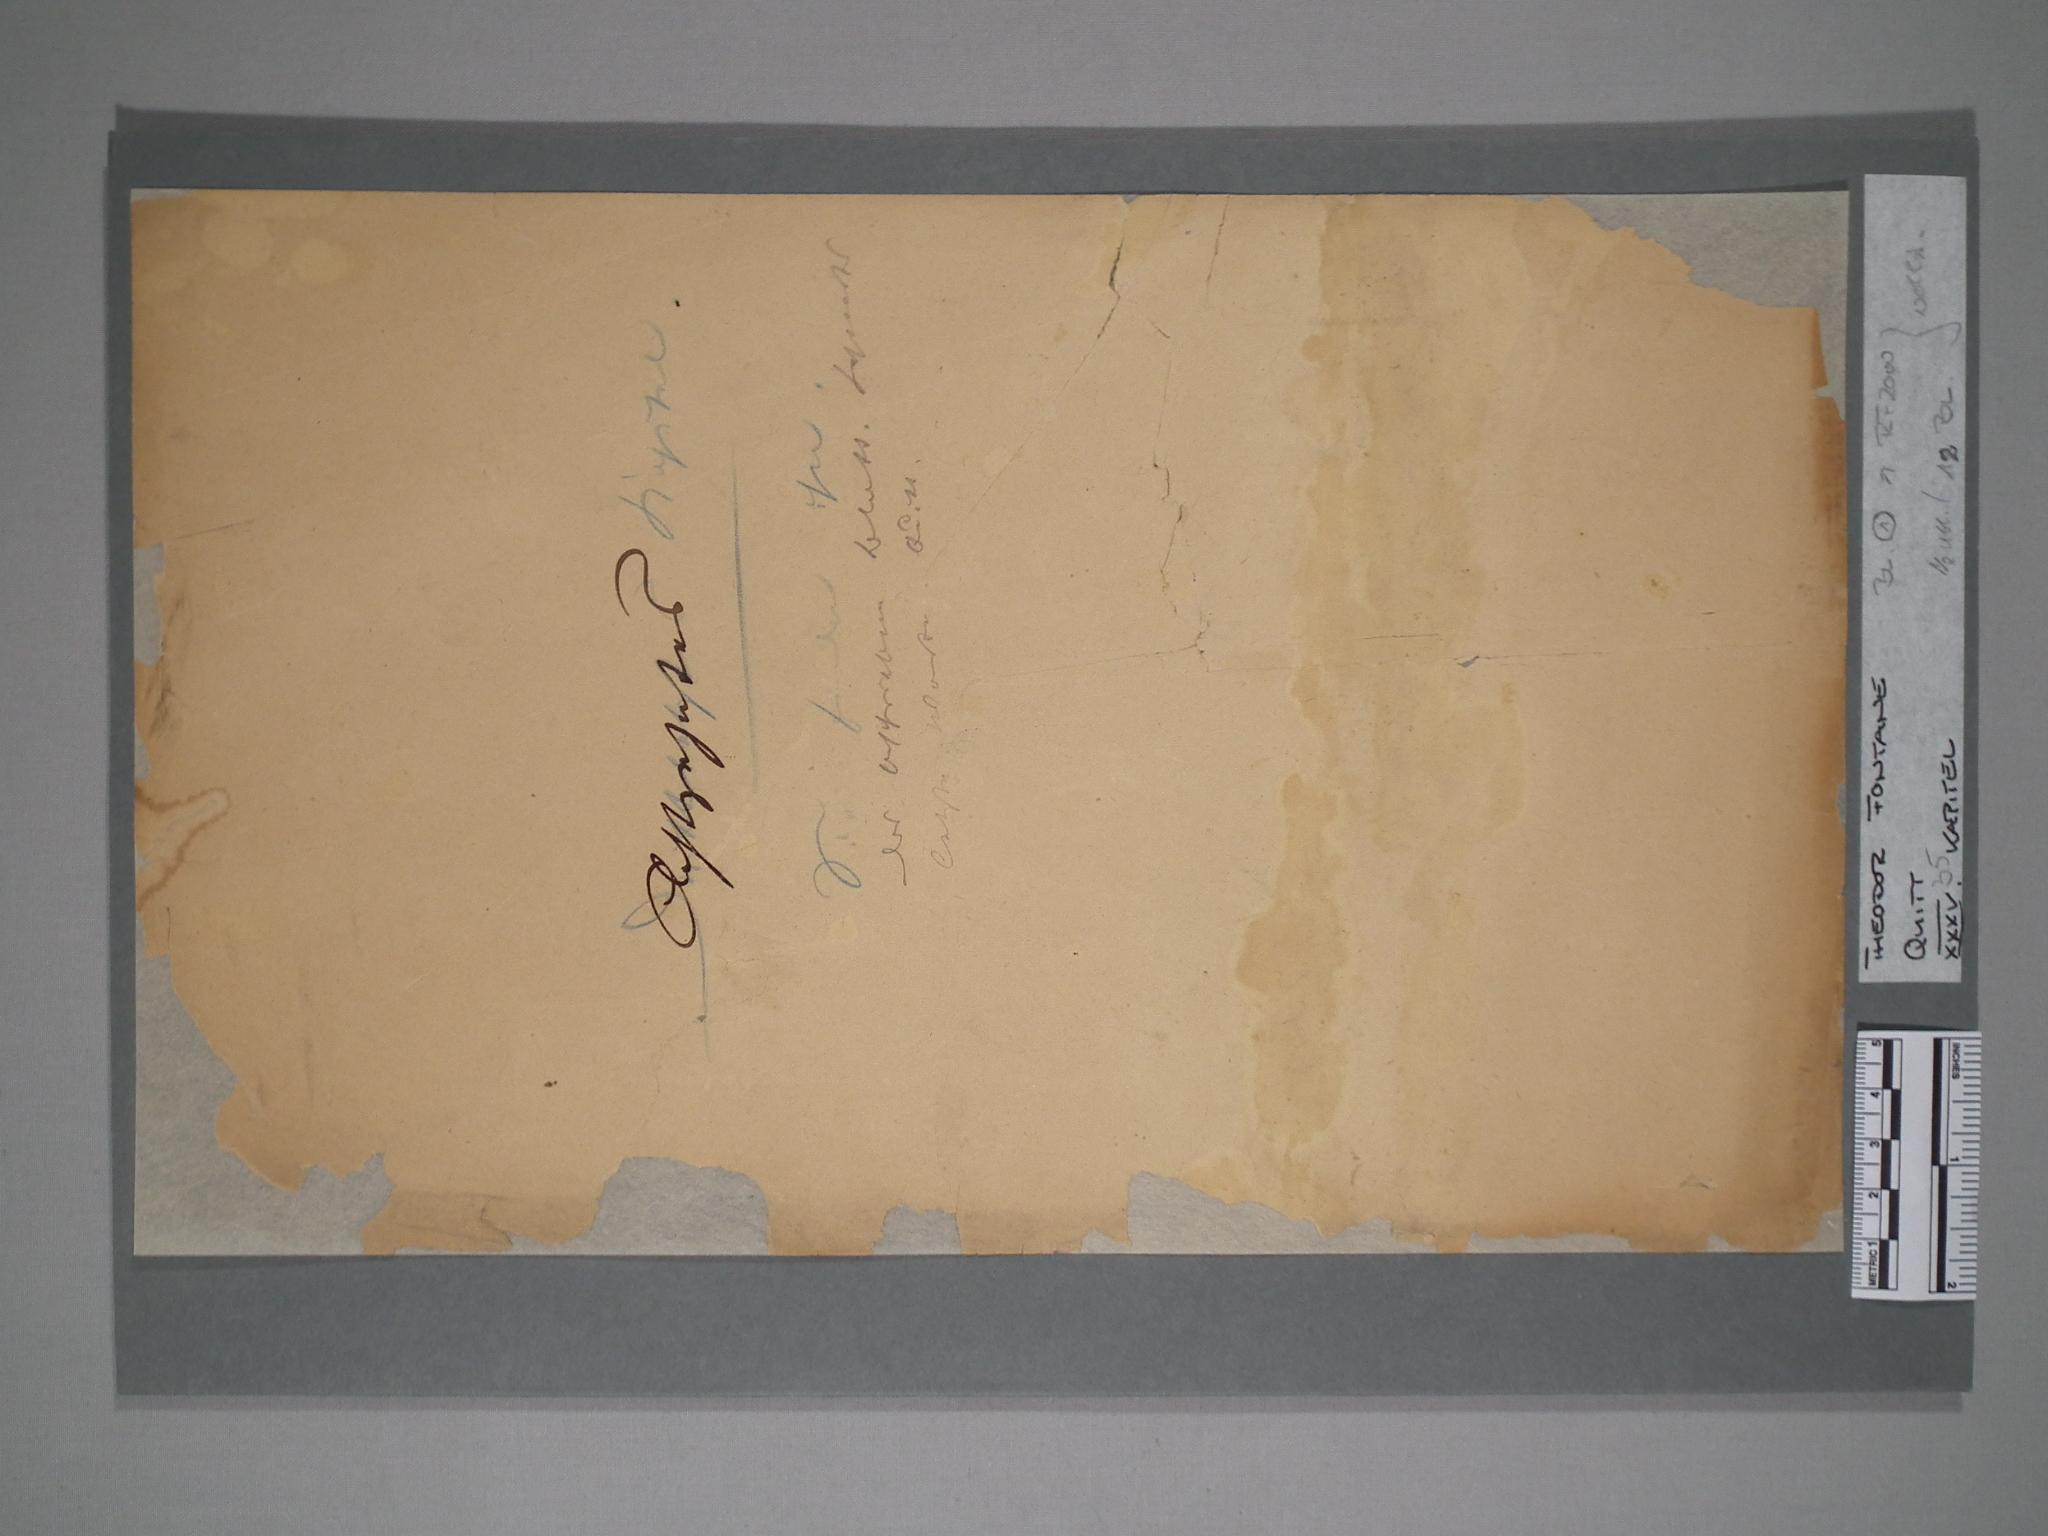 Fontane-Manuskript, Nachzustand.